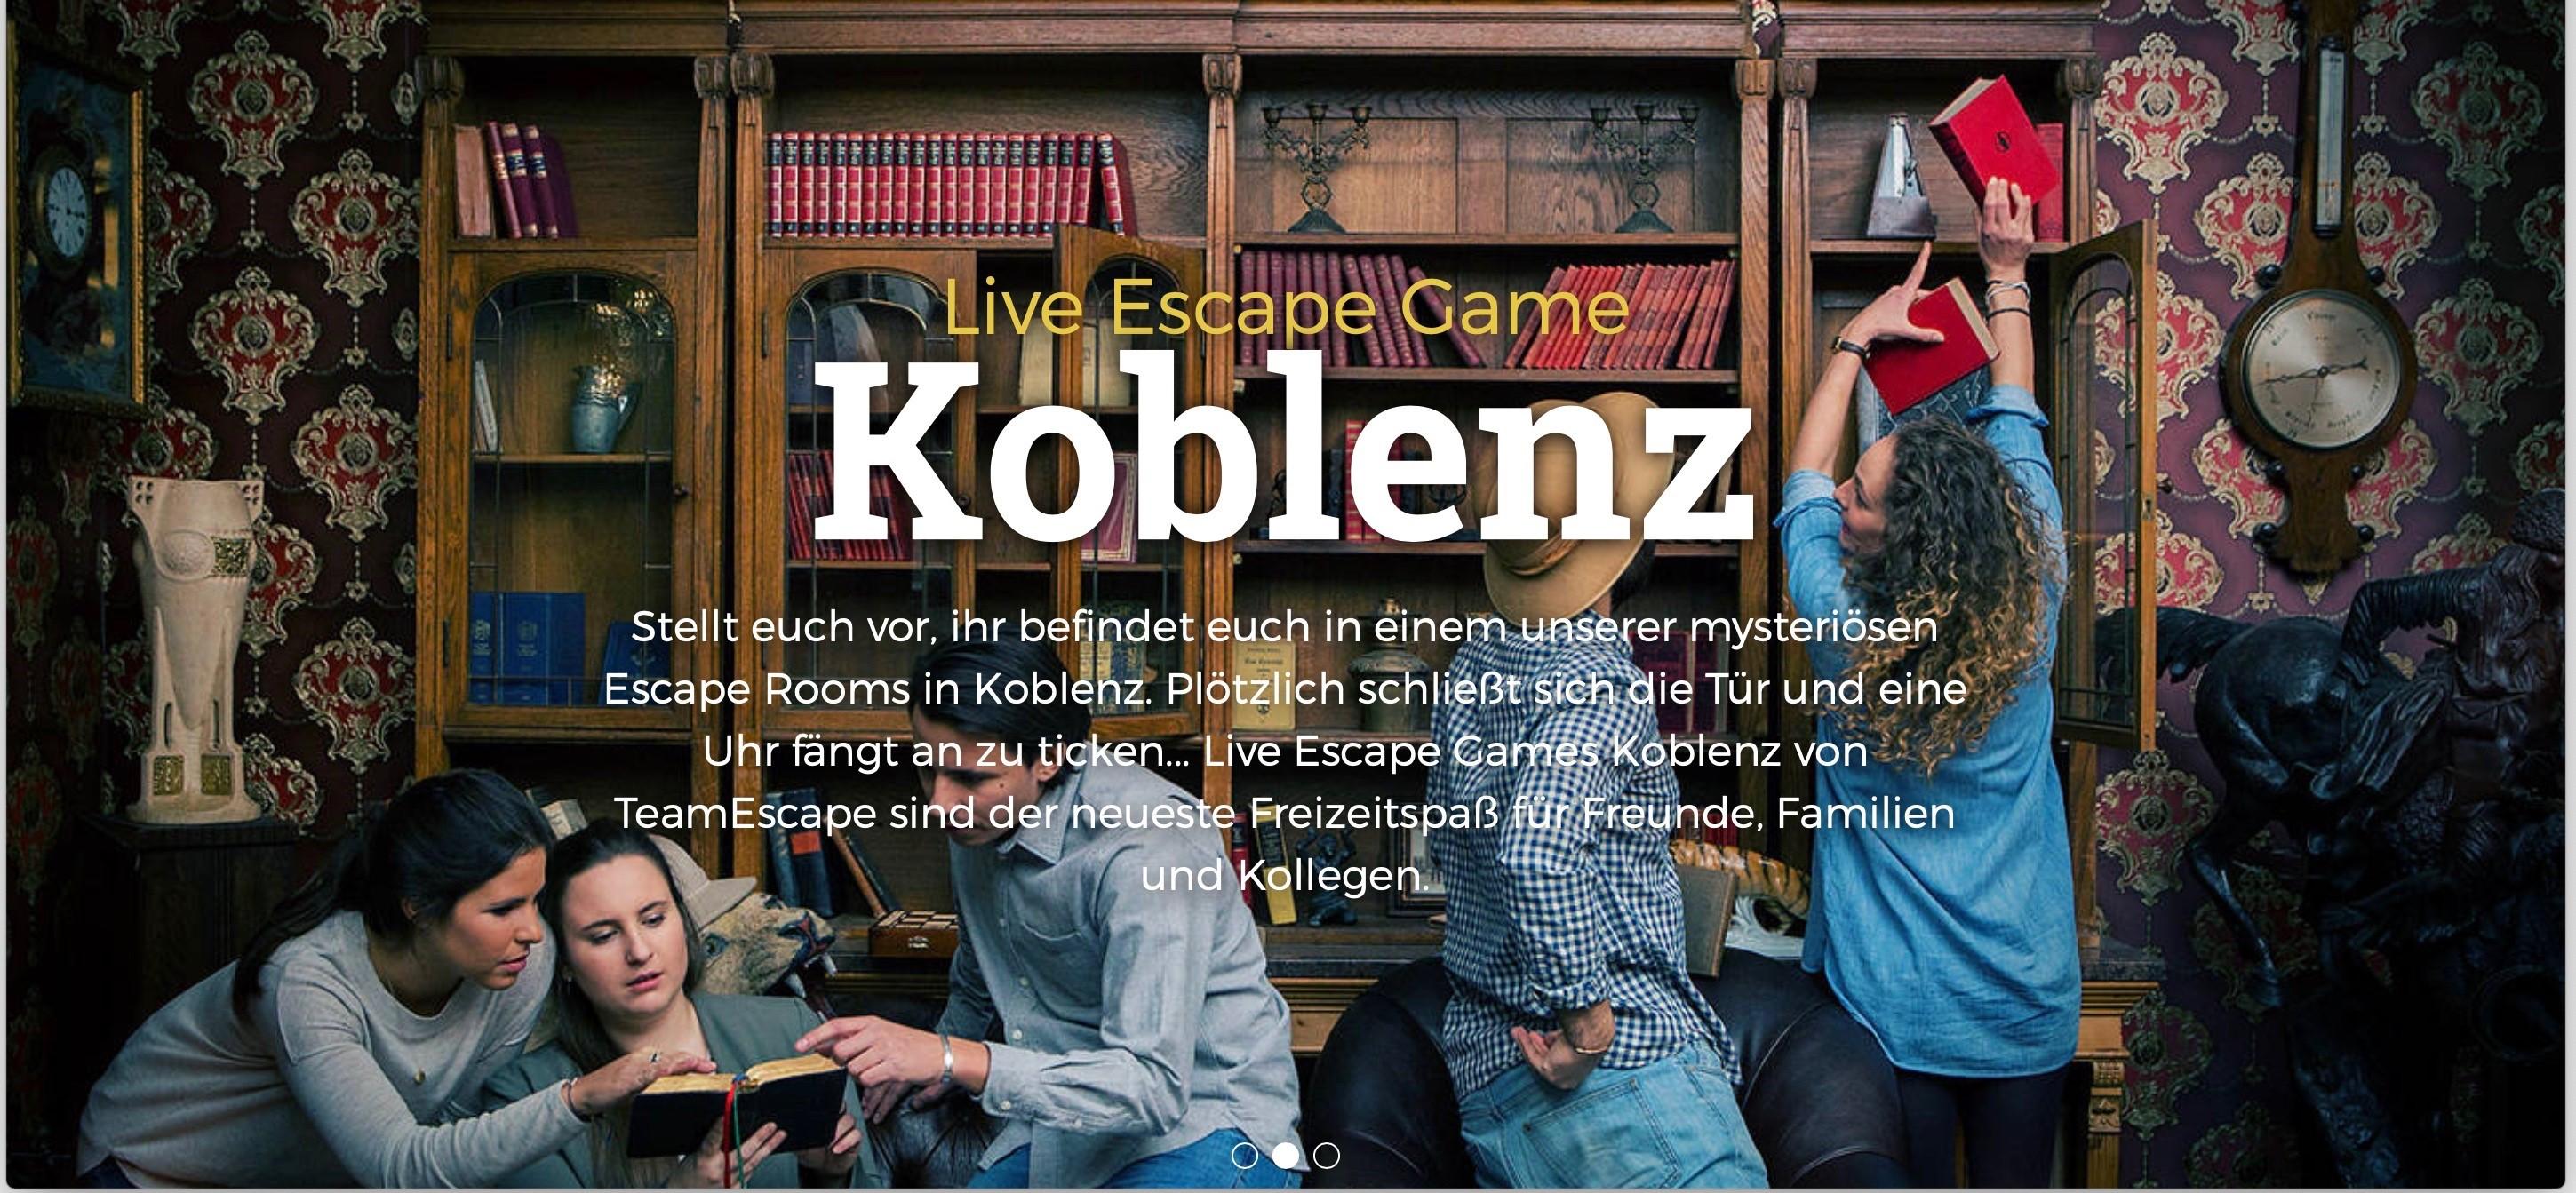 Teamescape Koblenz